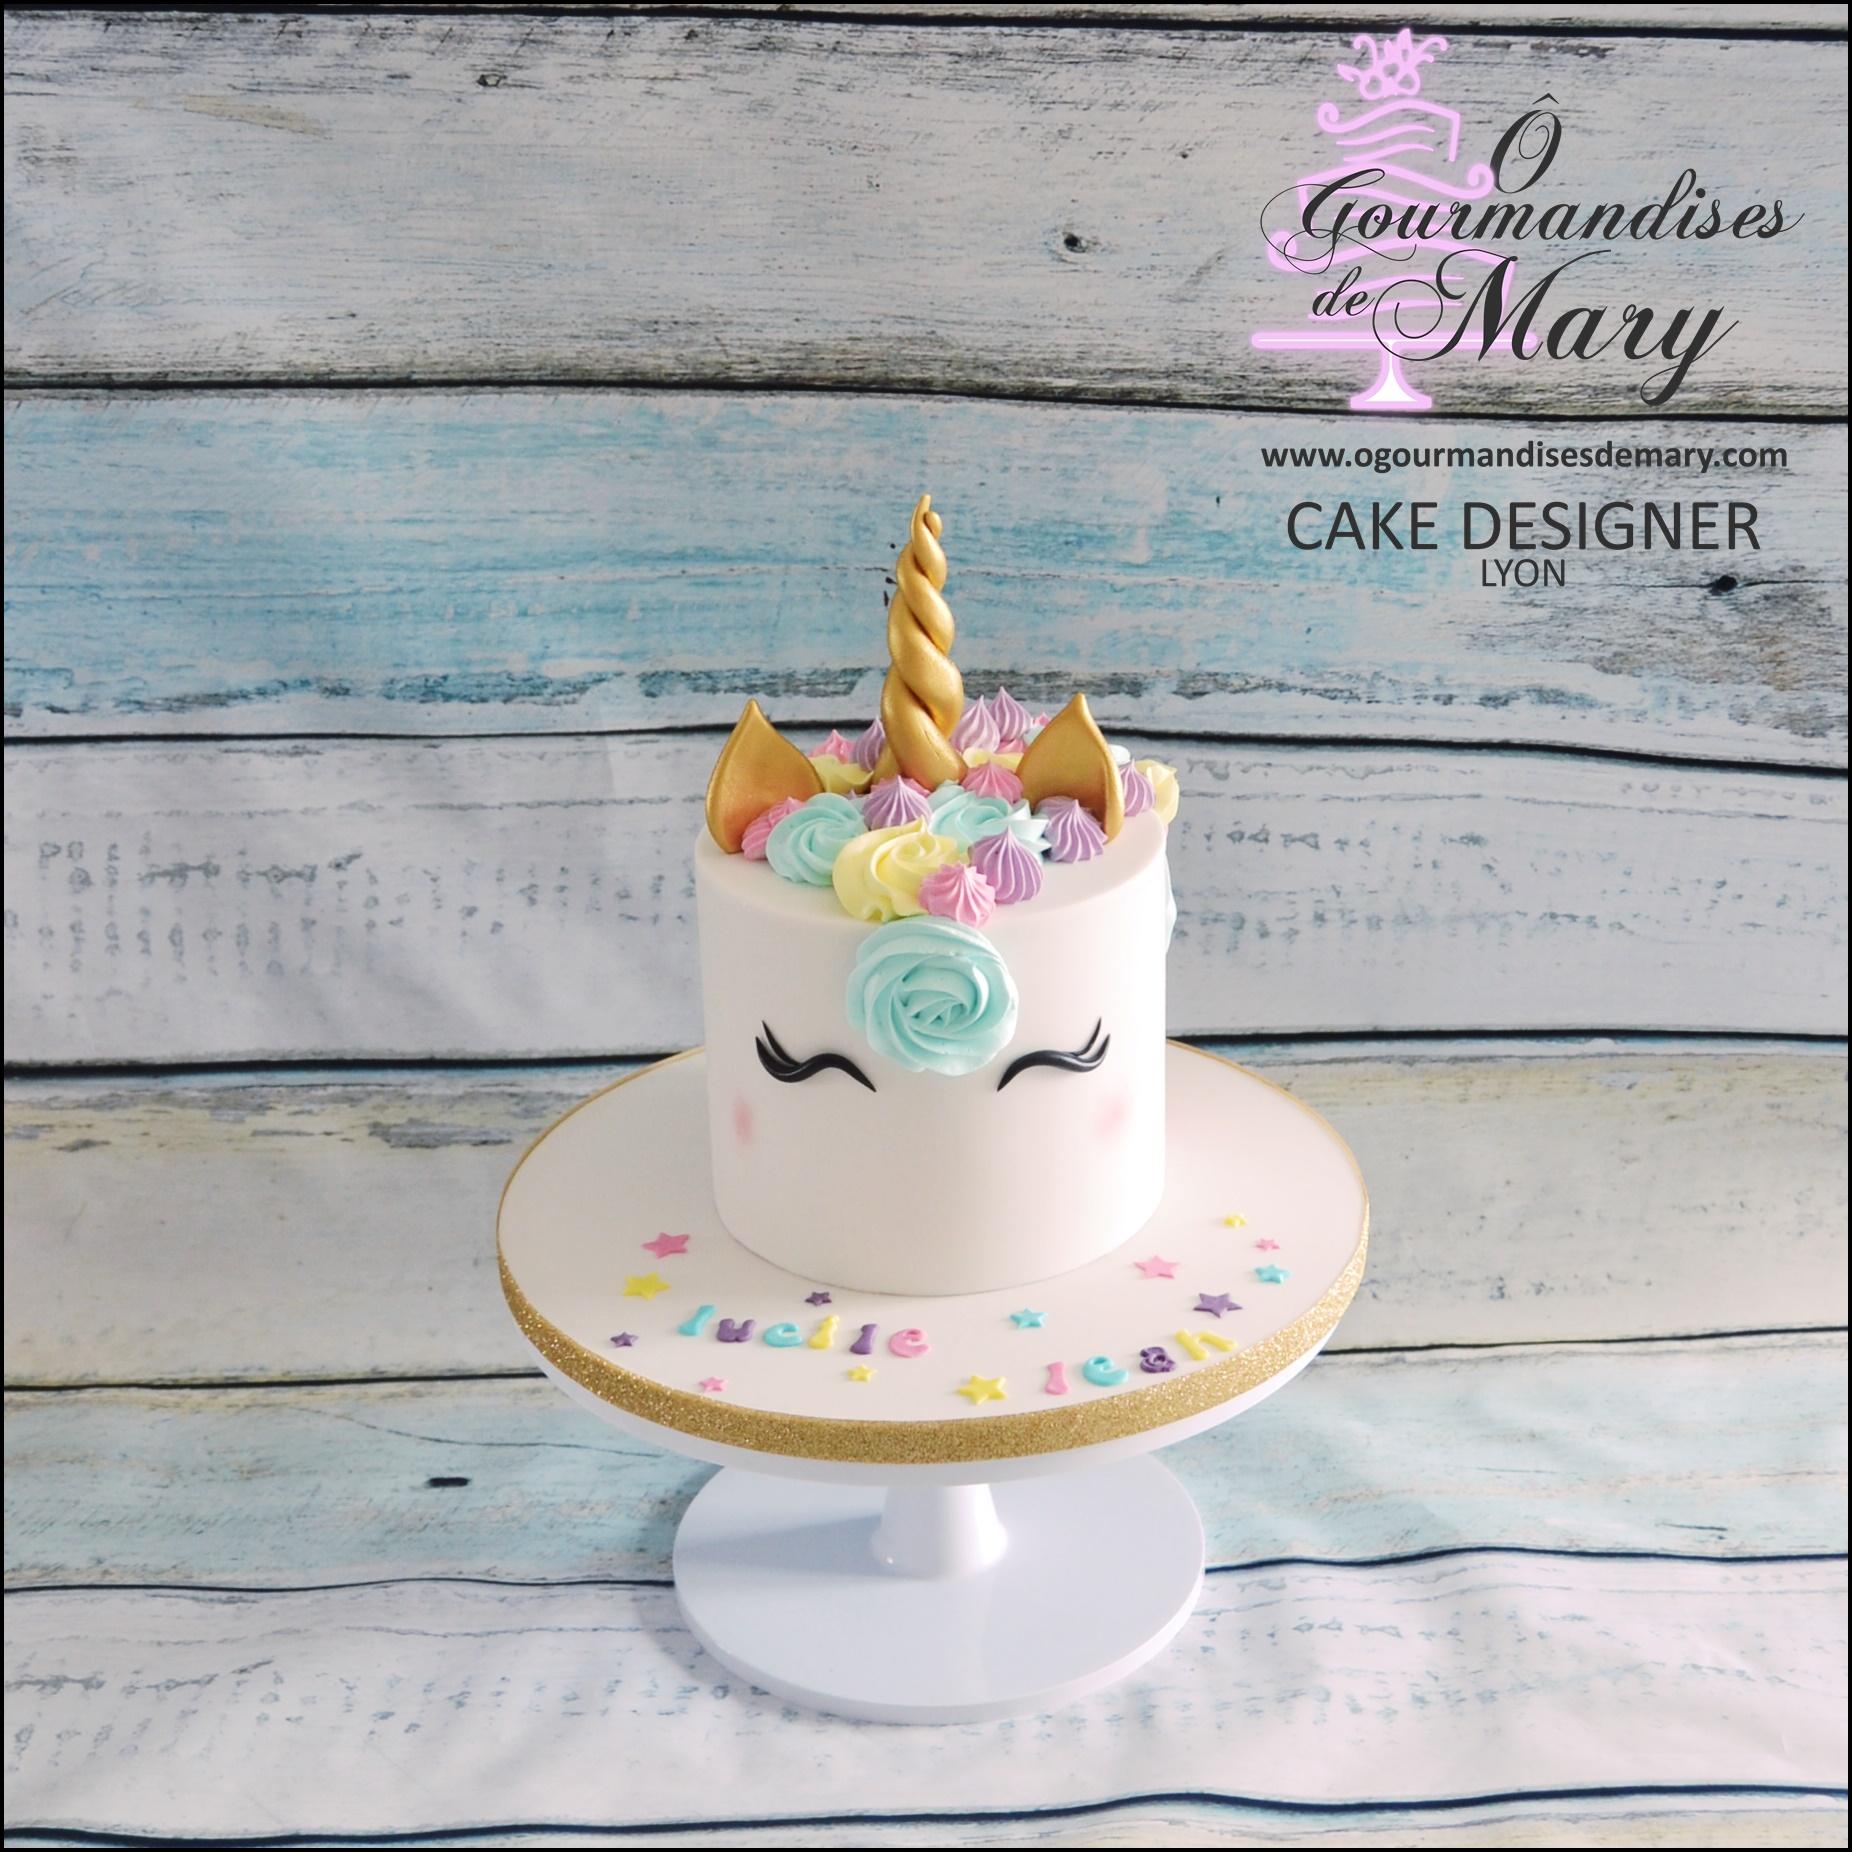 224_-_LICORNE__-_ô_gourmandises_de_mary_